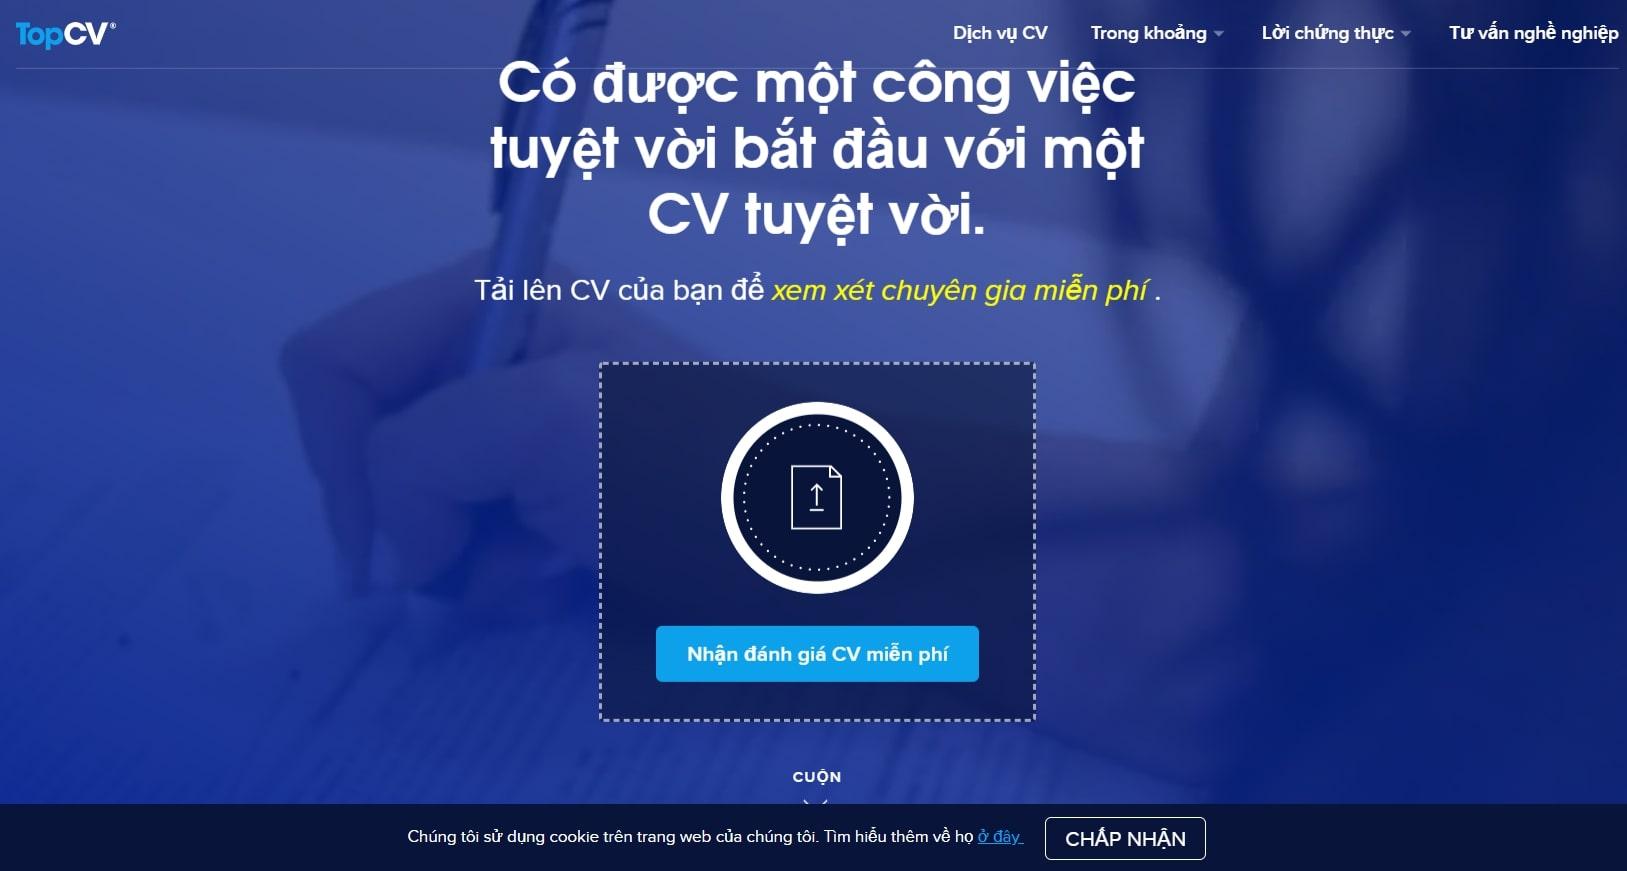 Topcv - website tạo Cv online